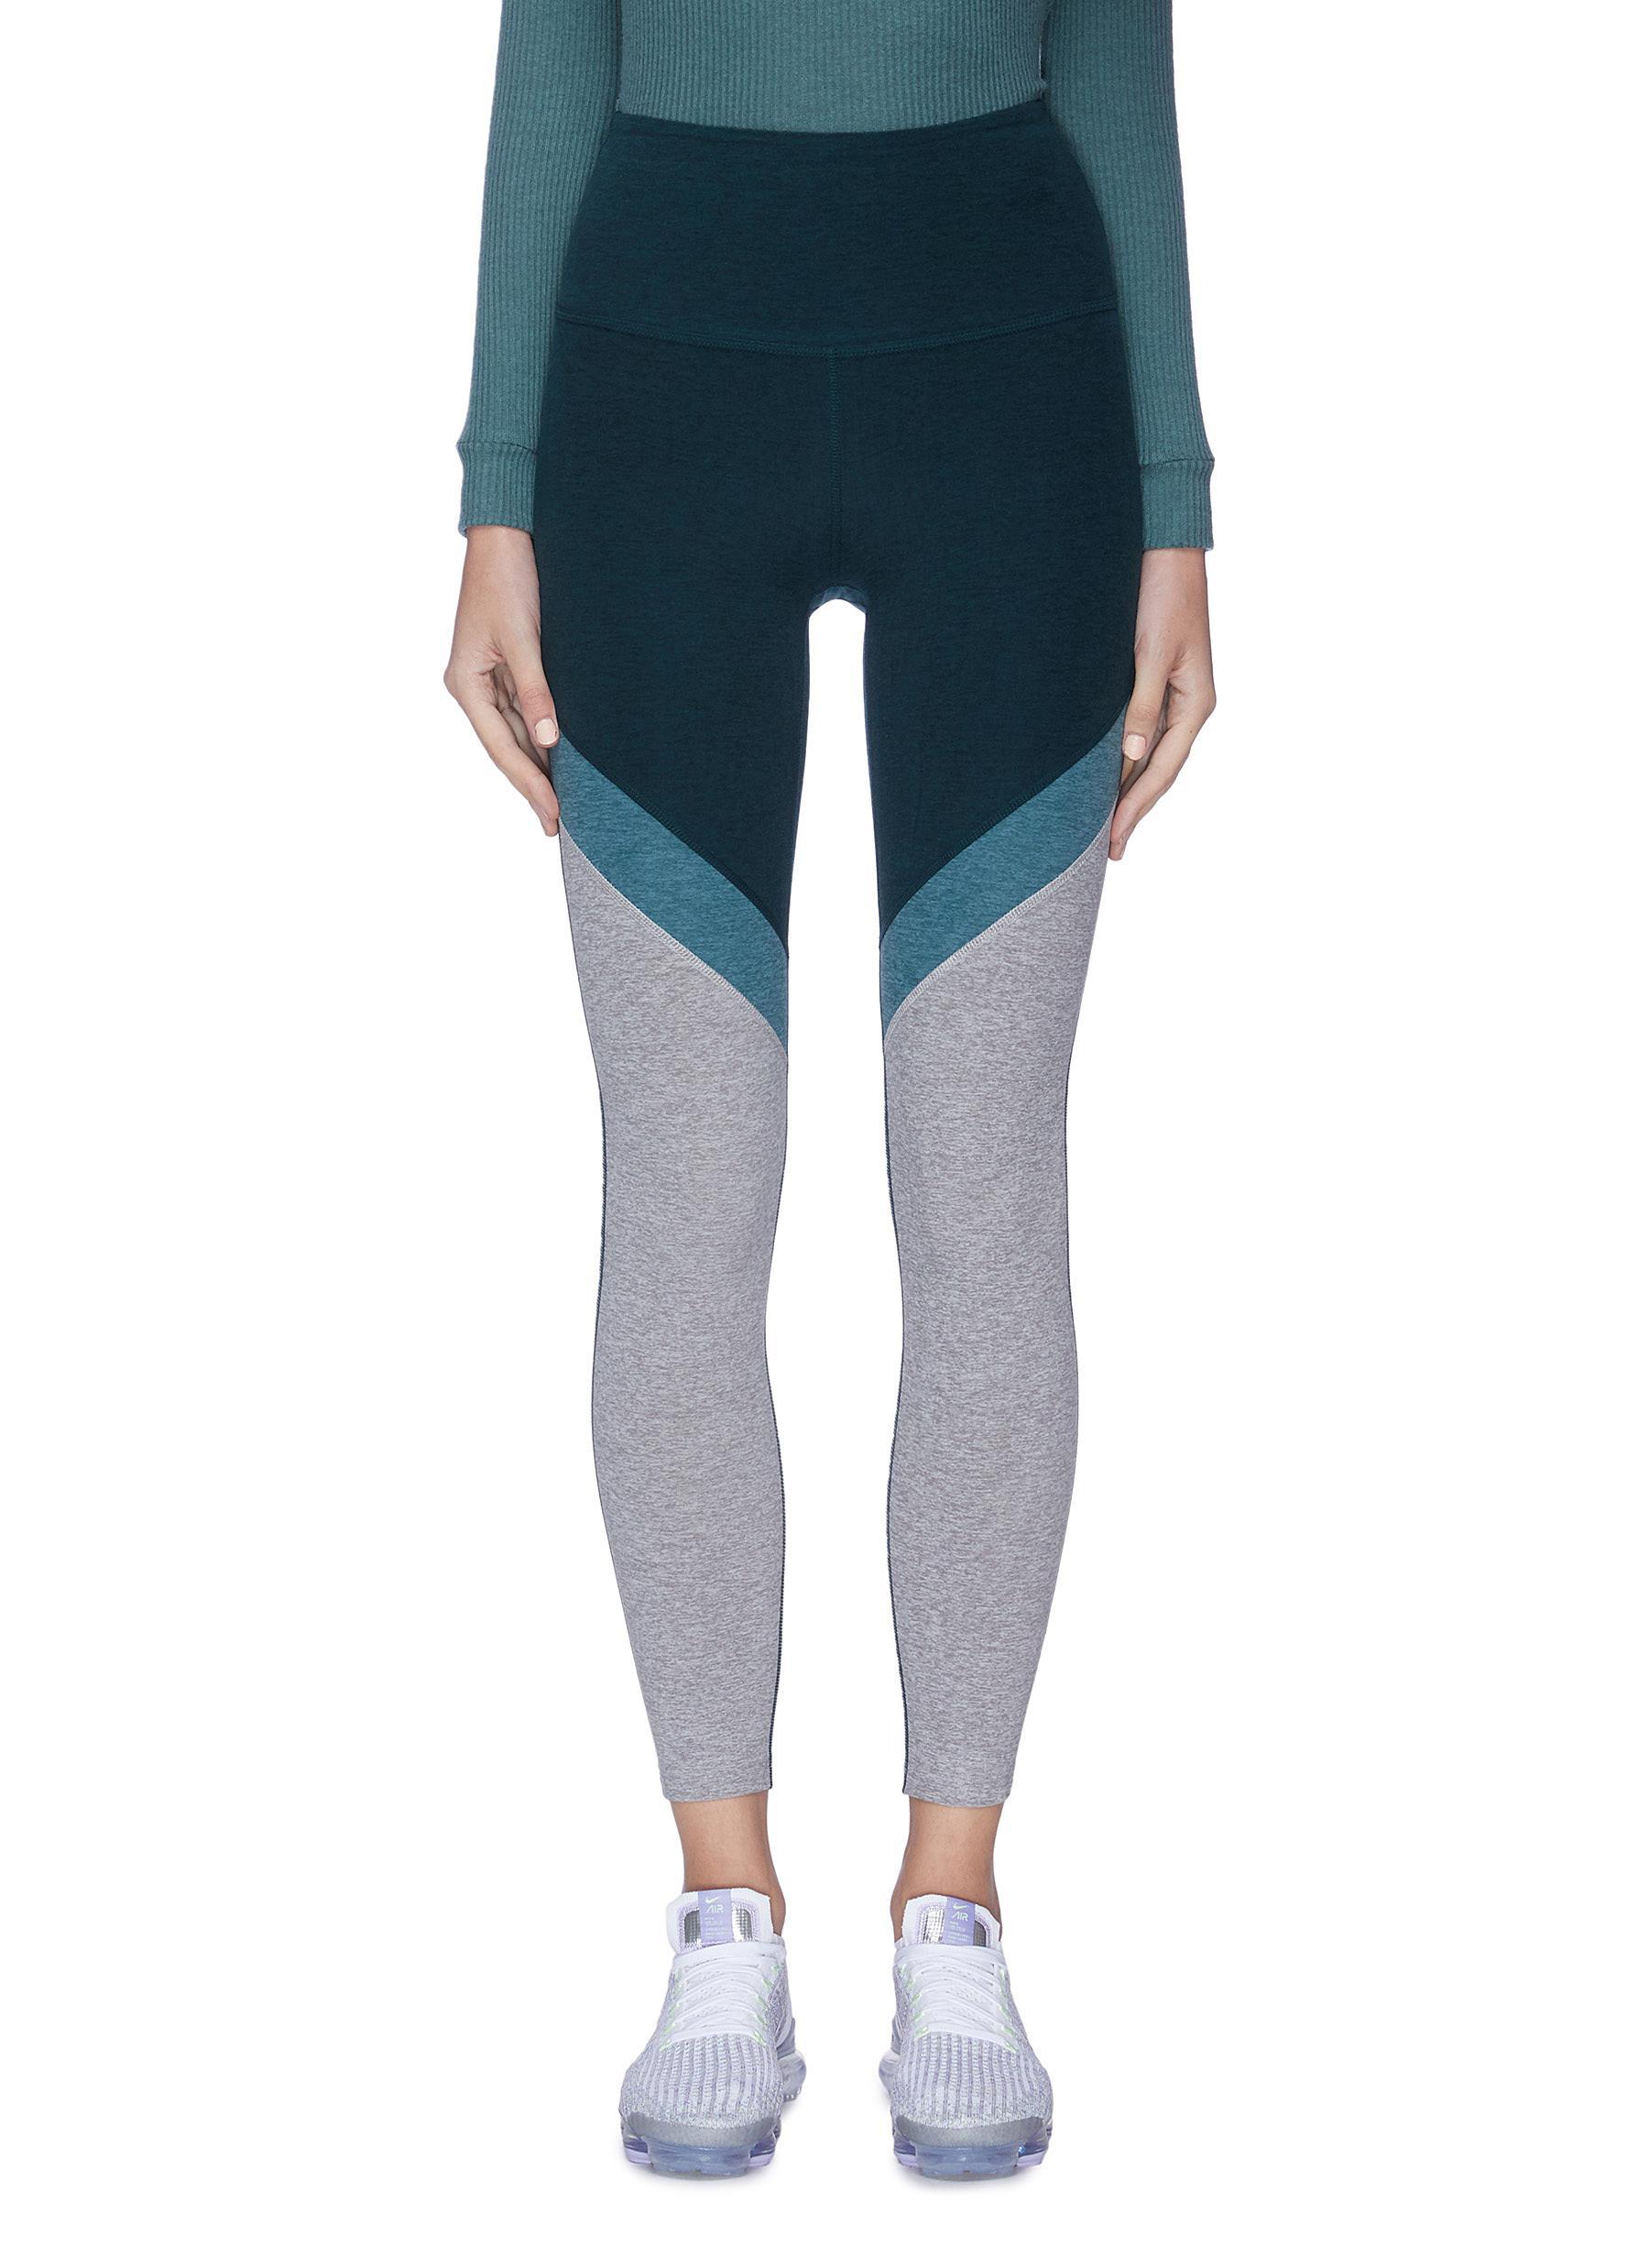 Buy Beyond Yoga Pants & Shorts Tri-panel' space dye high waisted midi leggings